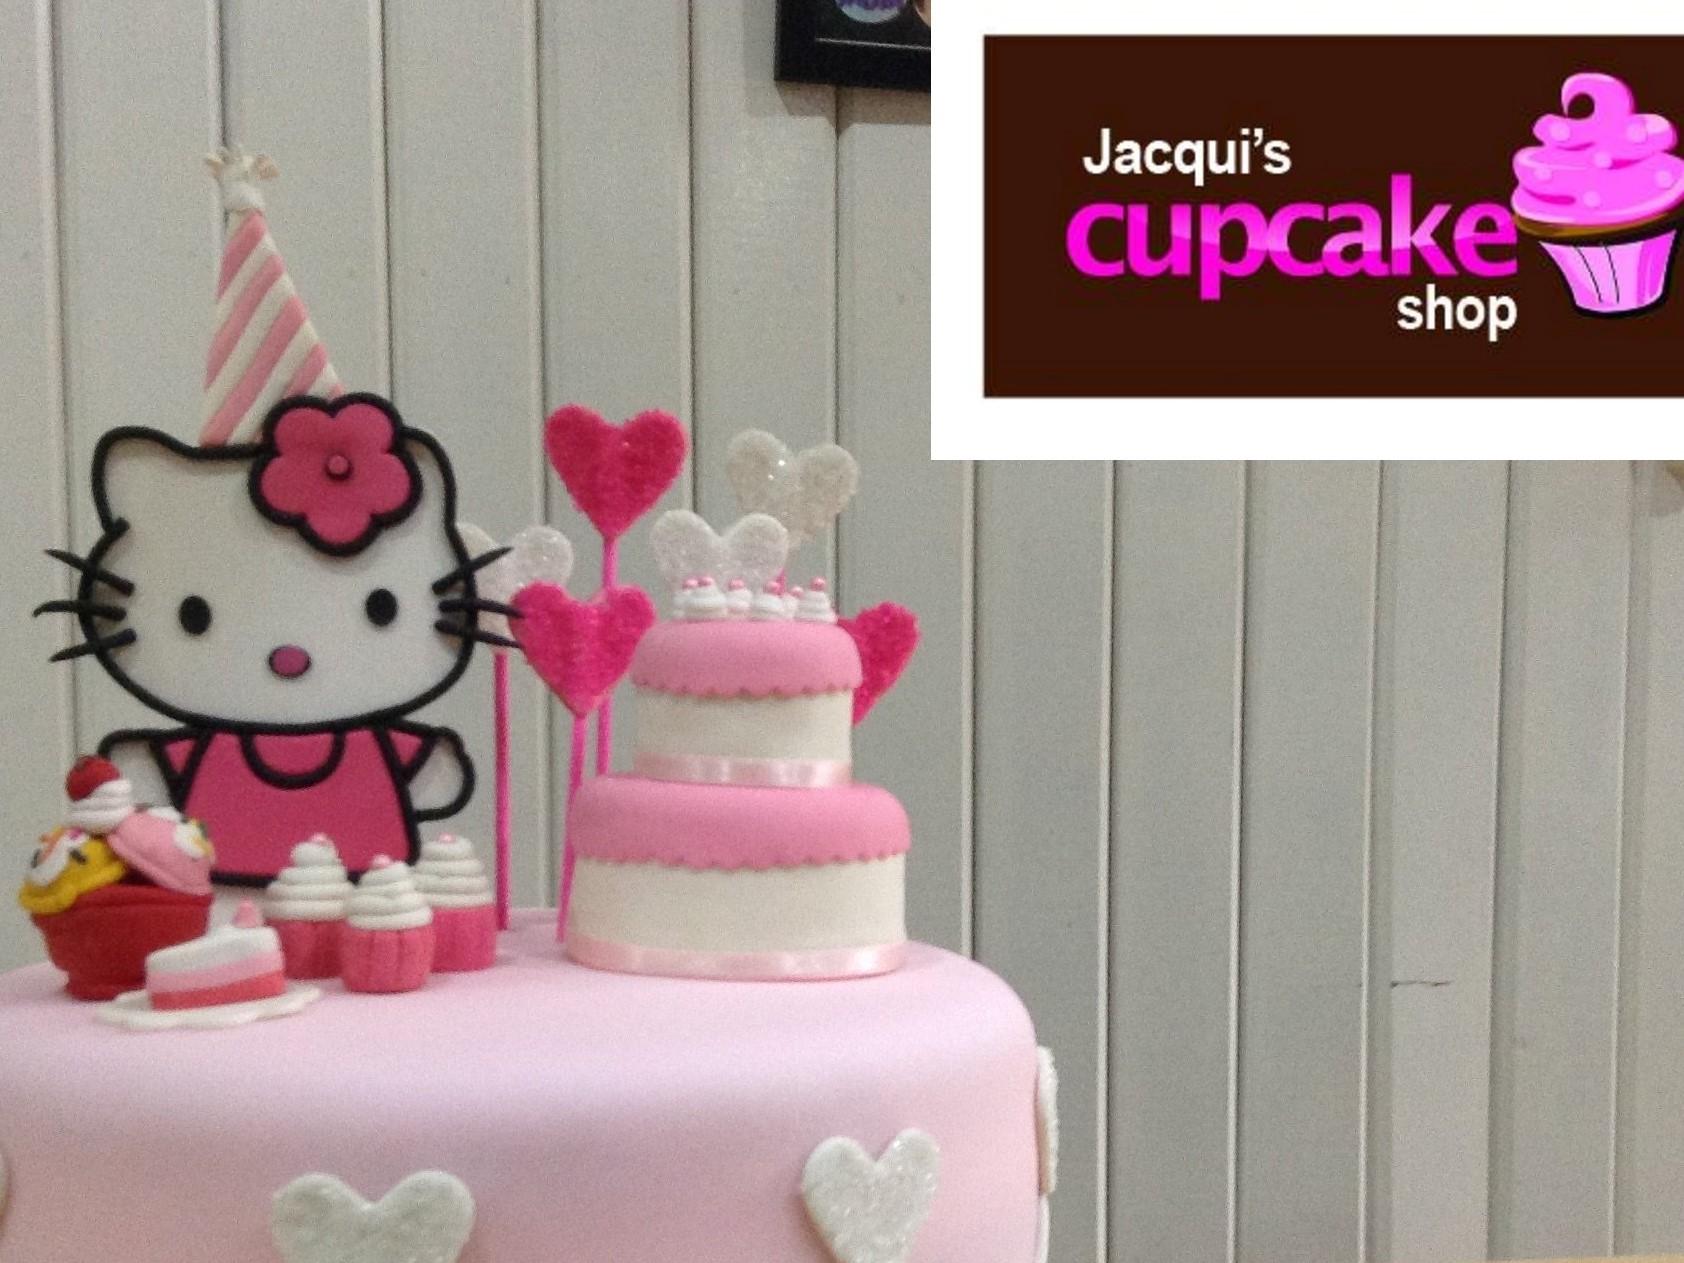 Jacqui's Hello Kitty customized baptismal cake